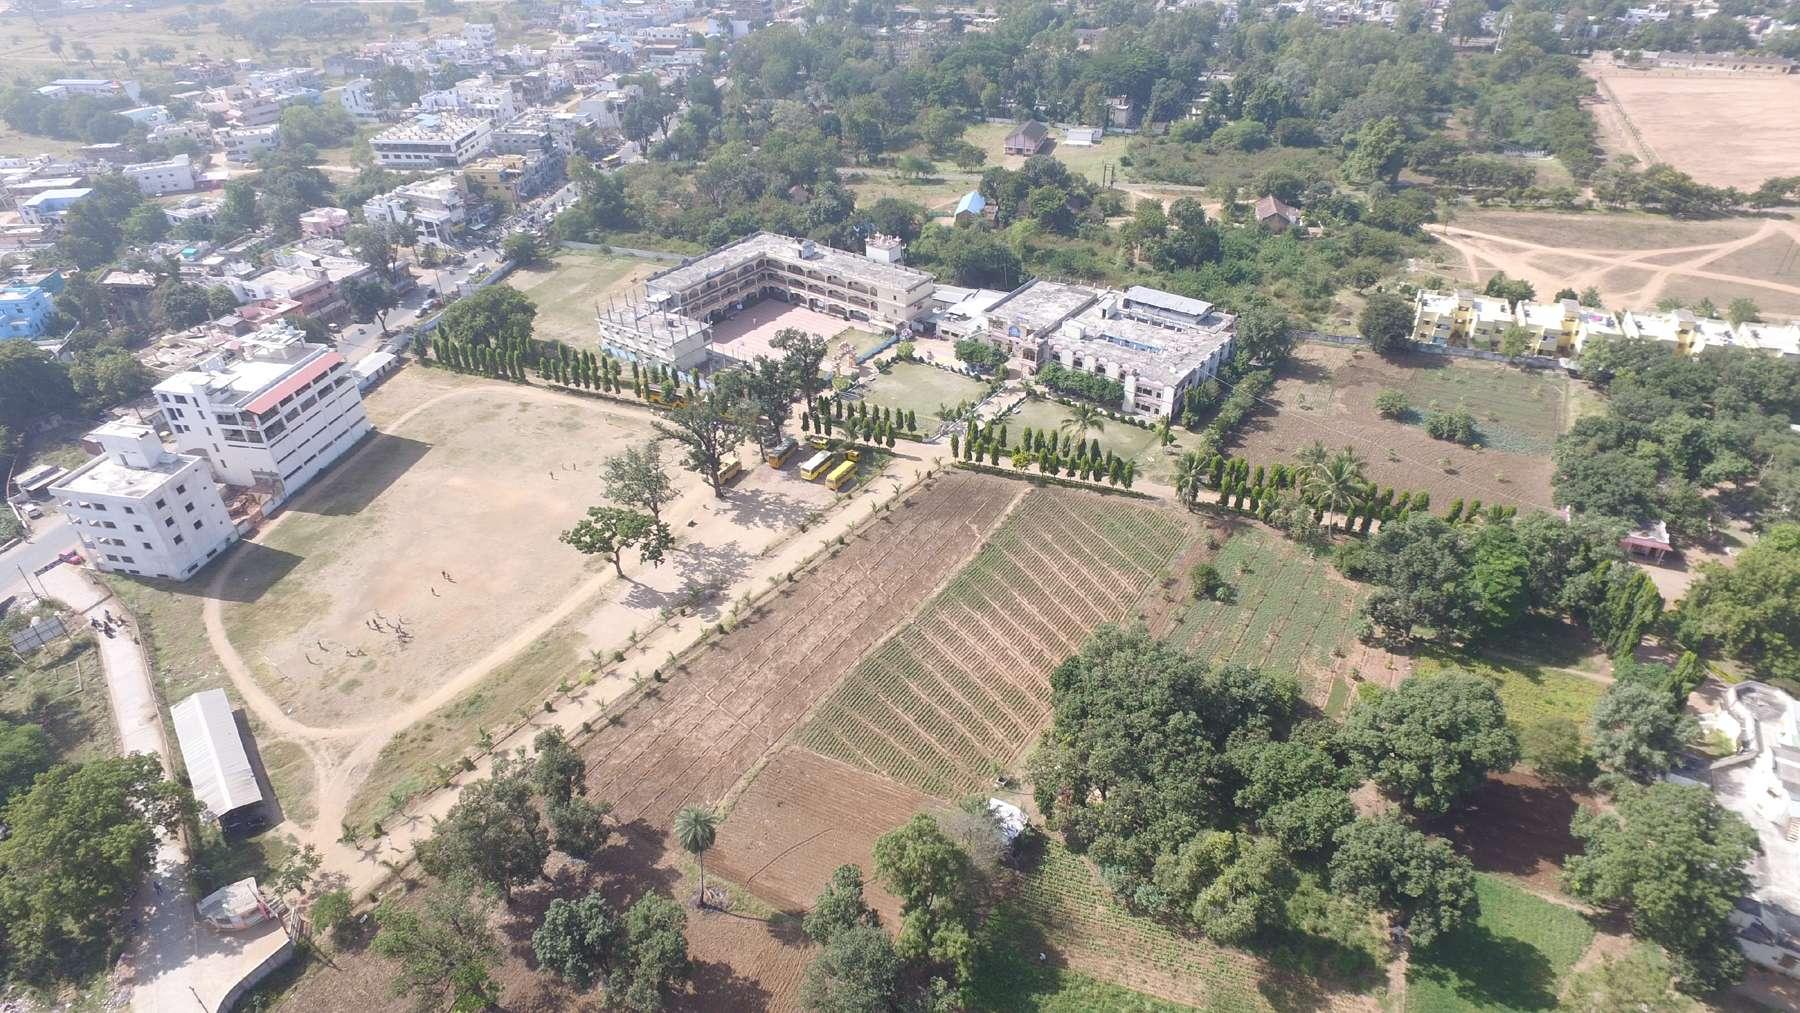 SANT SRI ASARAMJI HIGHER SECONDARY SCHOOL CHHINDWARA M P SHAKTI HOUSE PARASIA ROAD CHHINDWARA 1030616